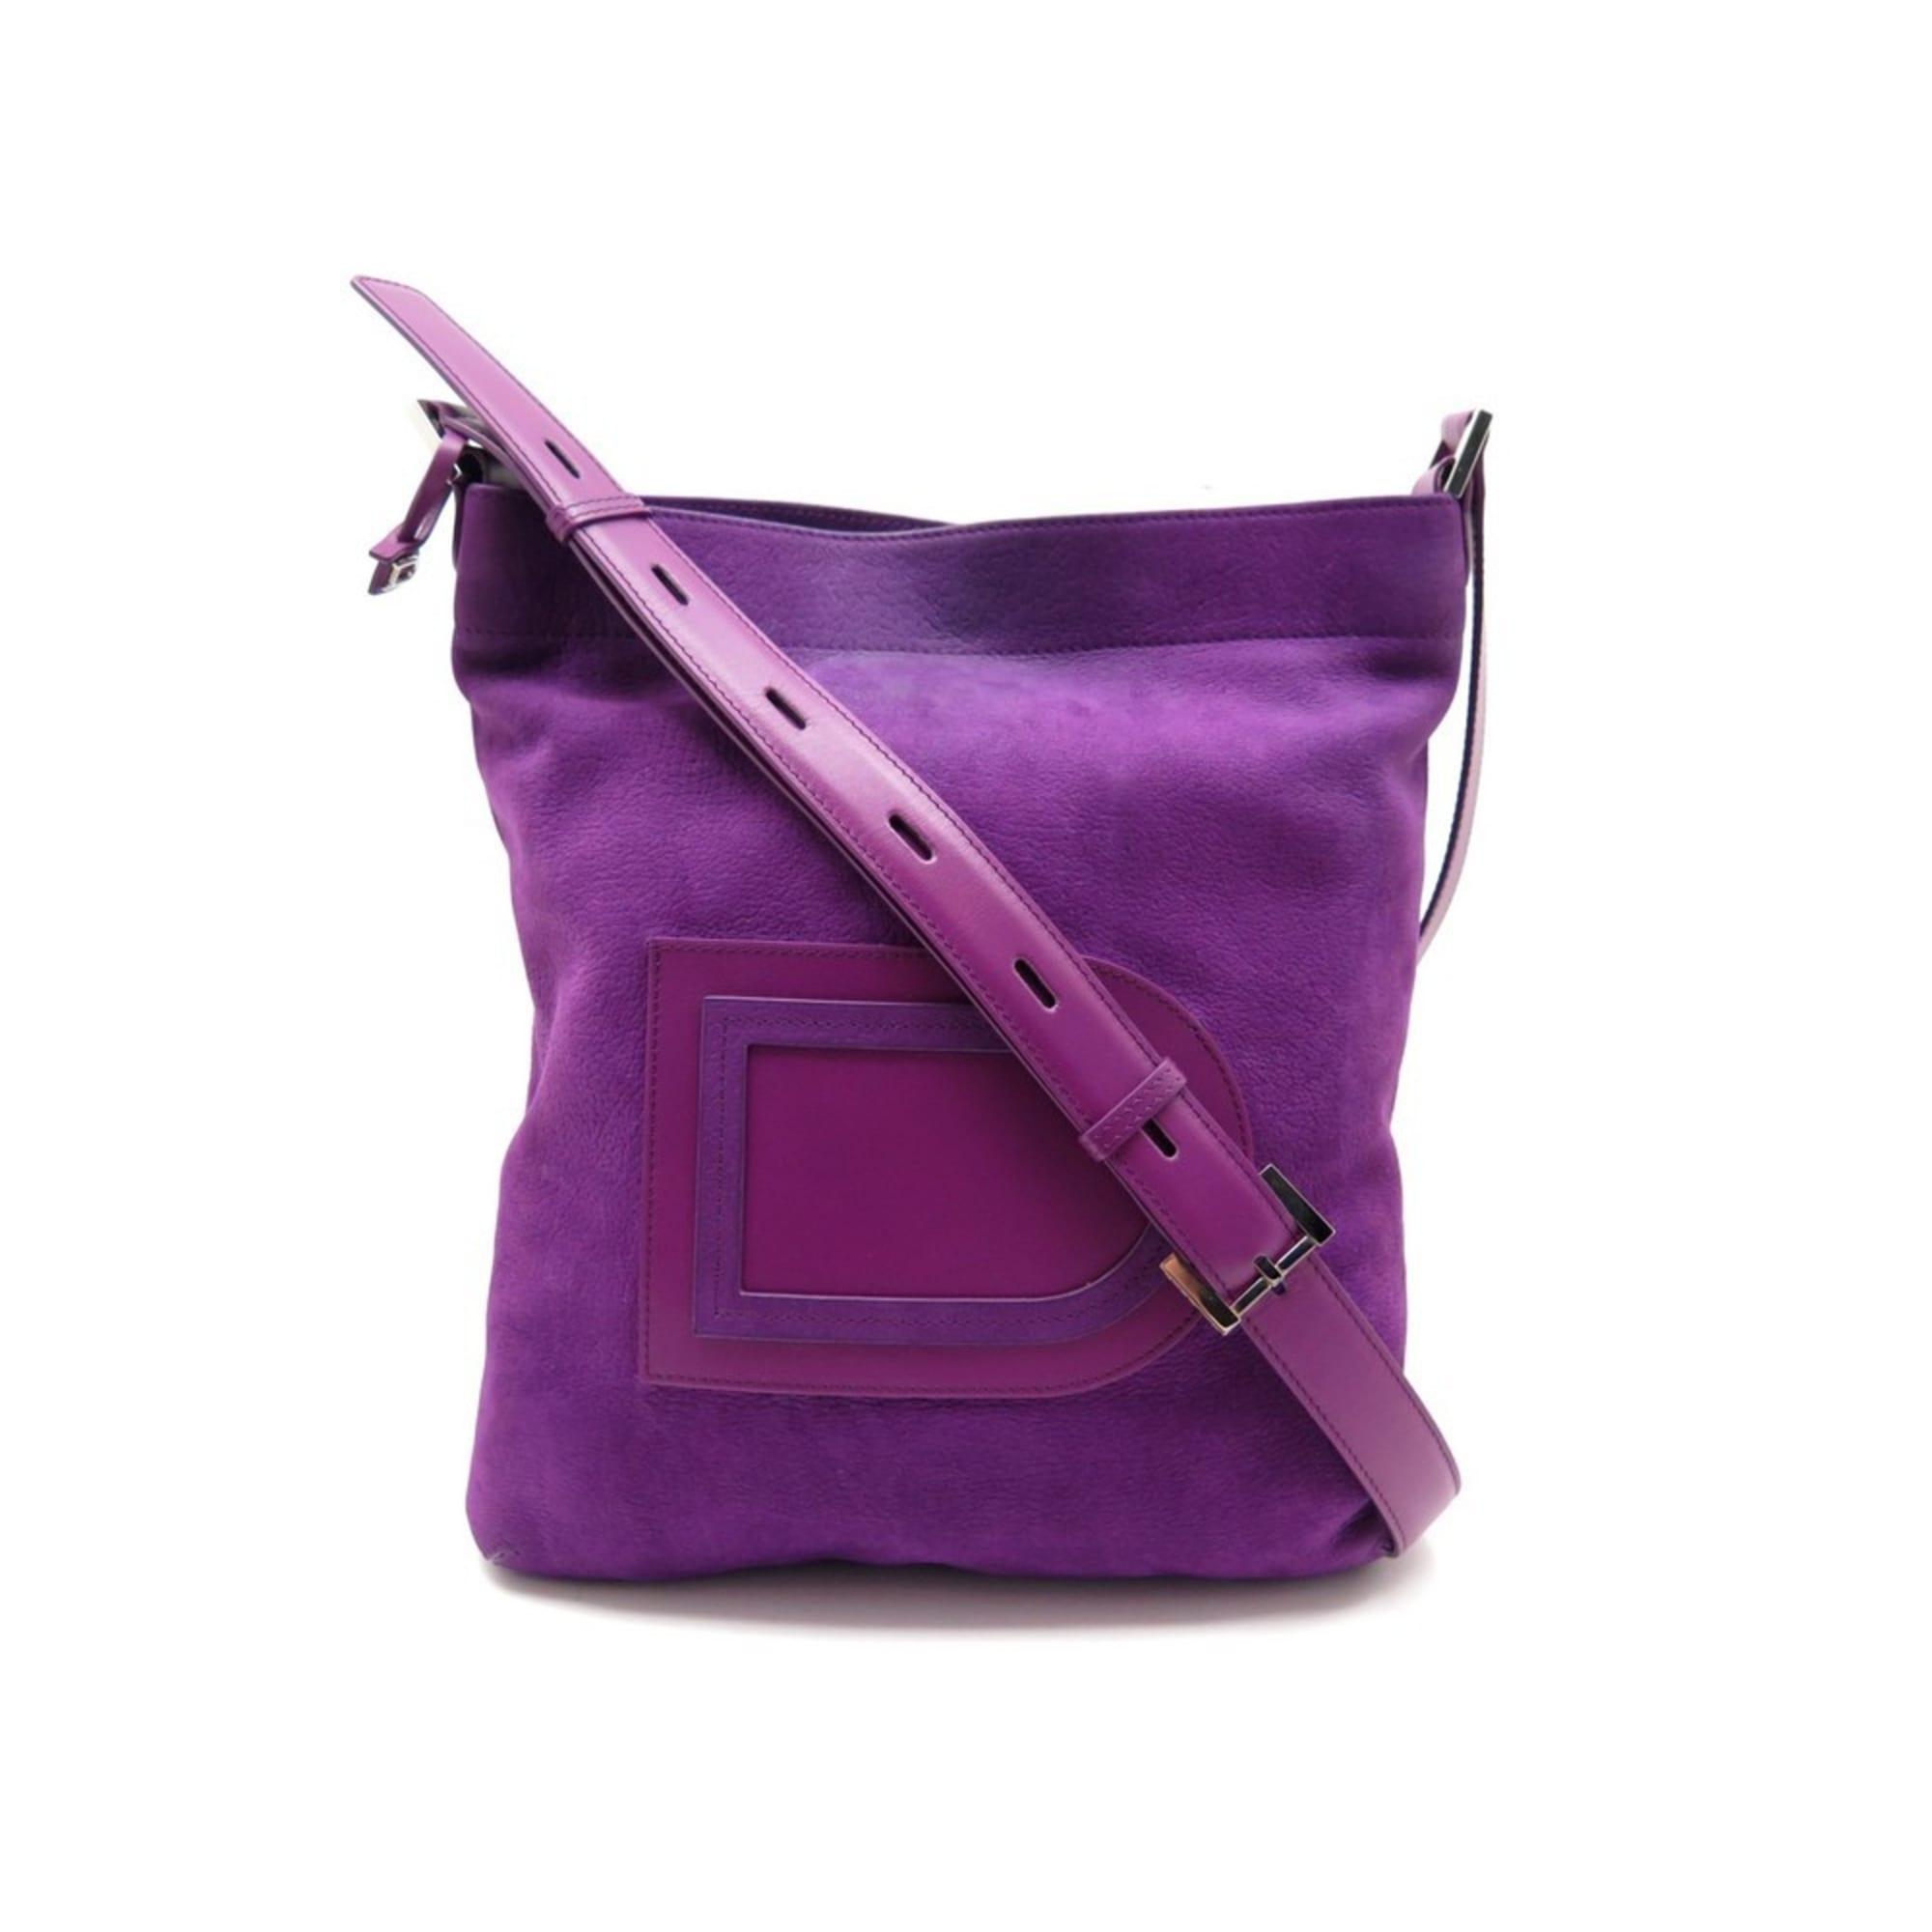 Sac à main en cuir DELVAUX cuir violet